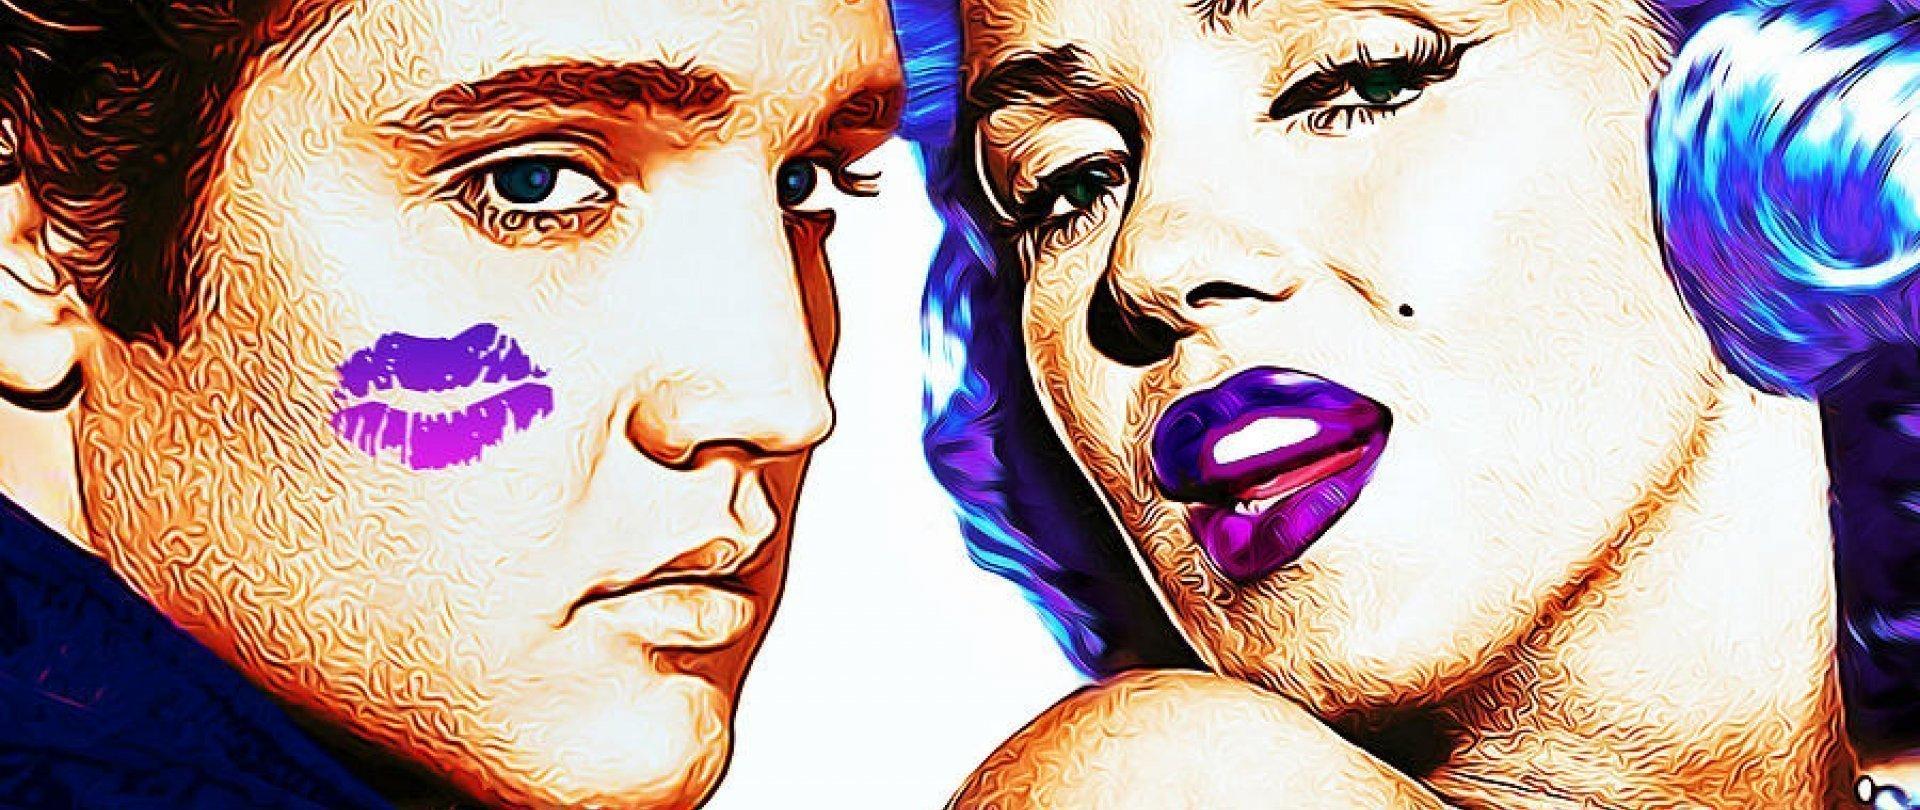 Bilety na Sylwester 2019/2020 Elvis Presley & Marylin Monroe Show  FIRST MINUTE